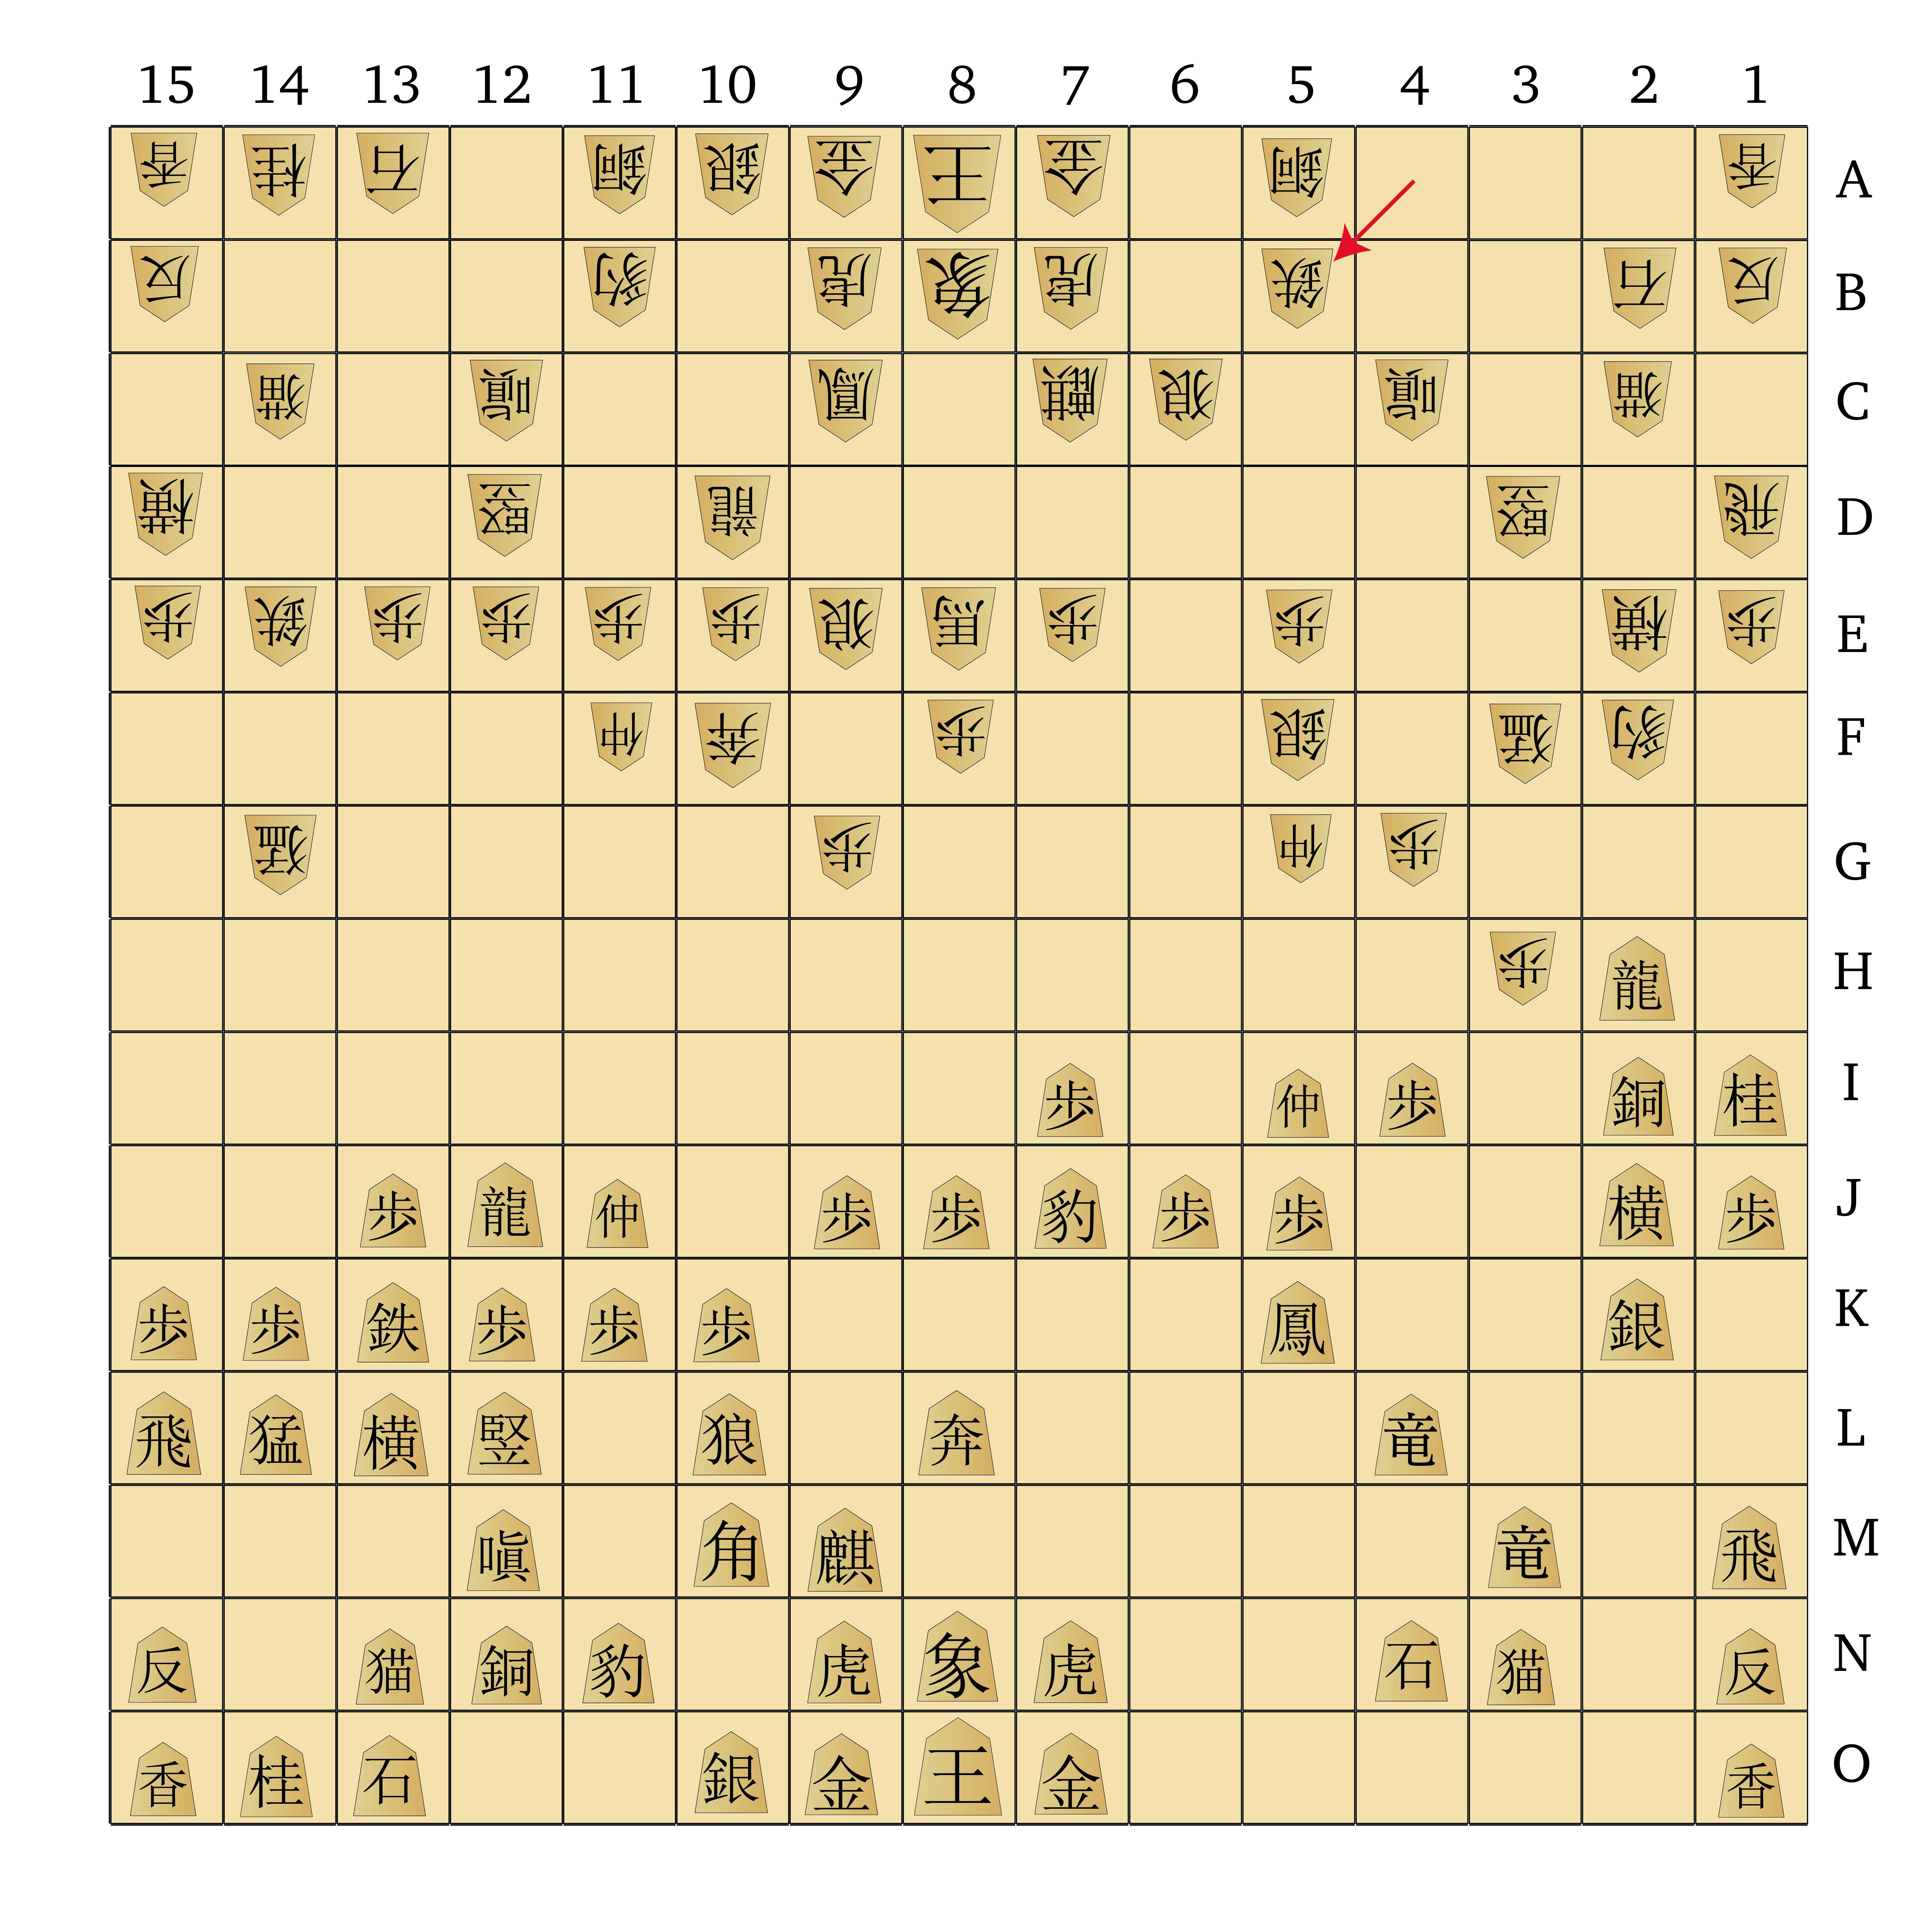 Dai Shogi 420 -- Move 170-01